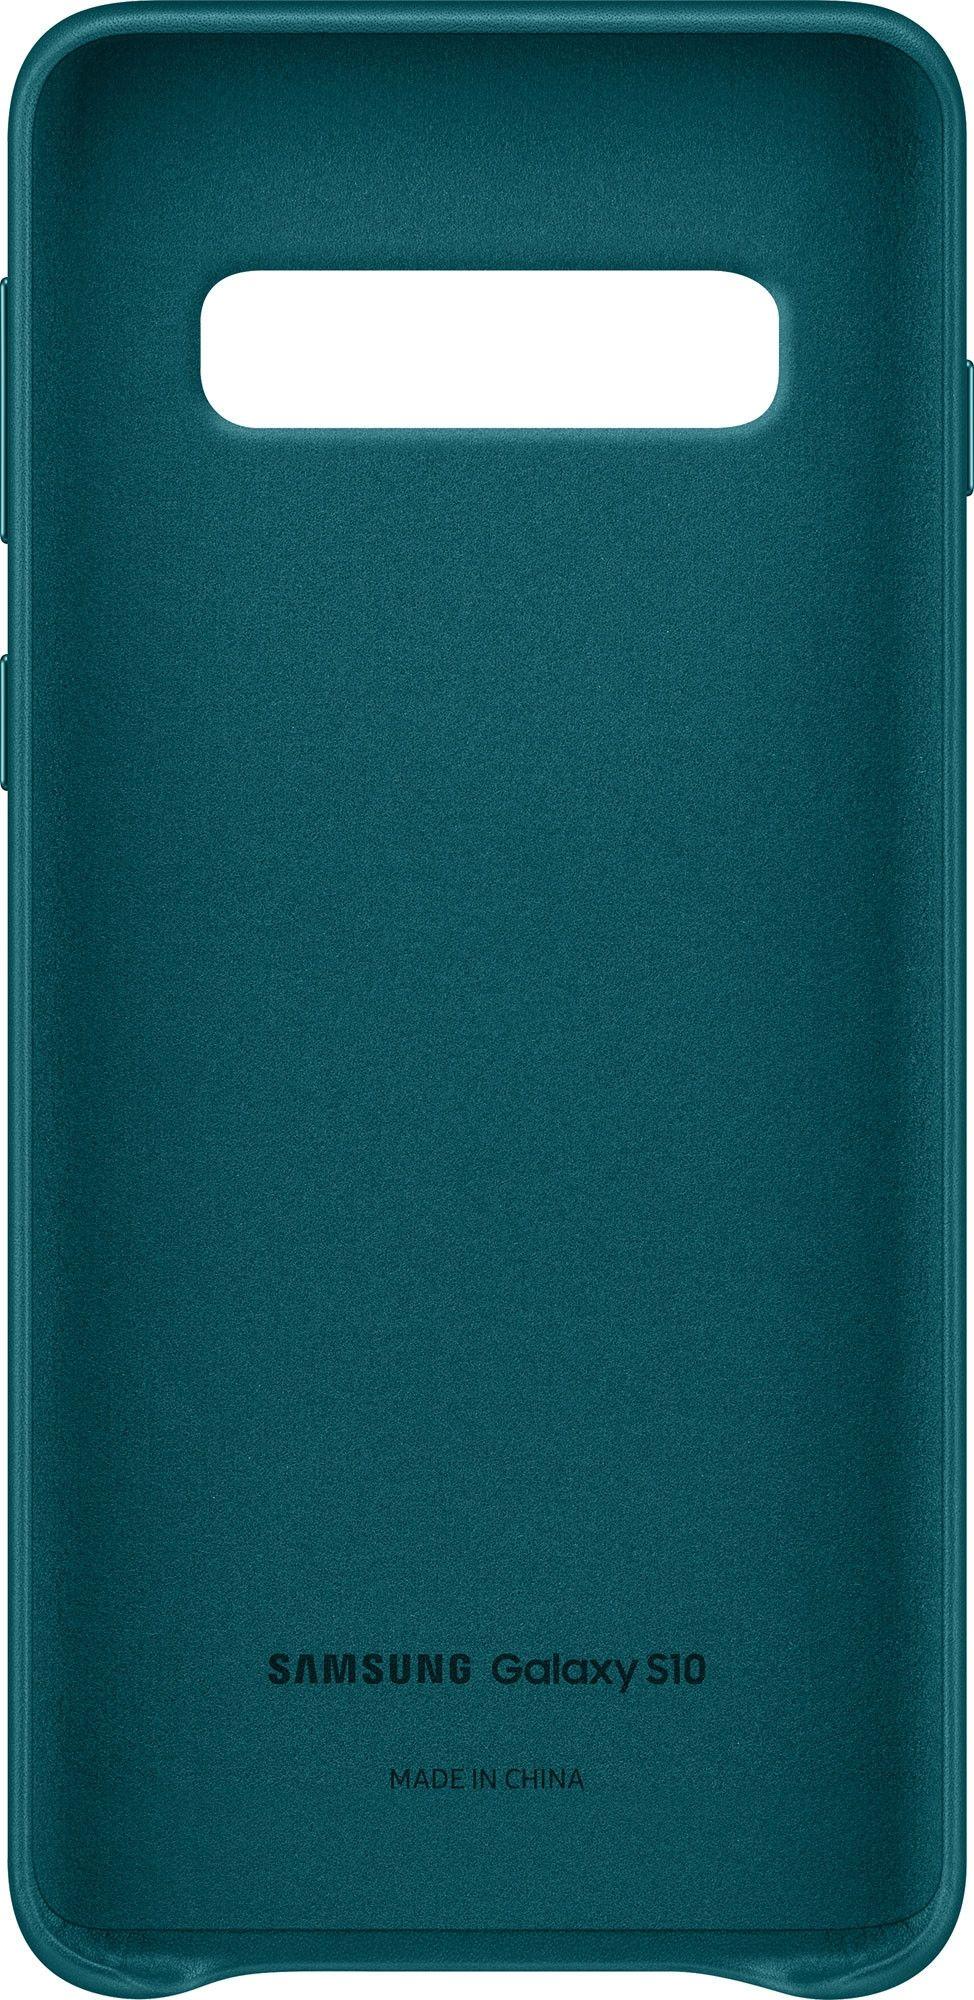 Панель Samsung Leather Cover для Samsung Galaxy S10 (EF-VG973LGEGRU) Green от Територія твоєї техніки - 2